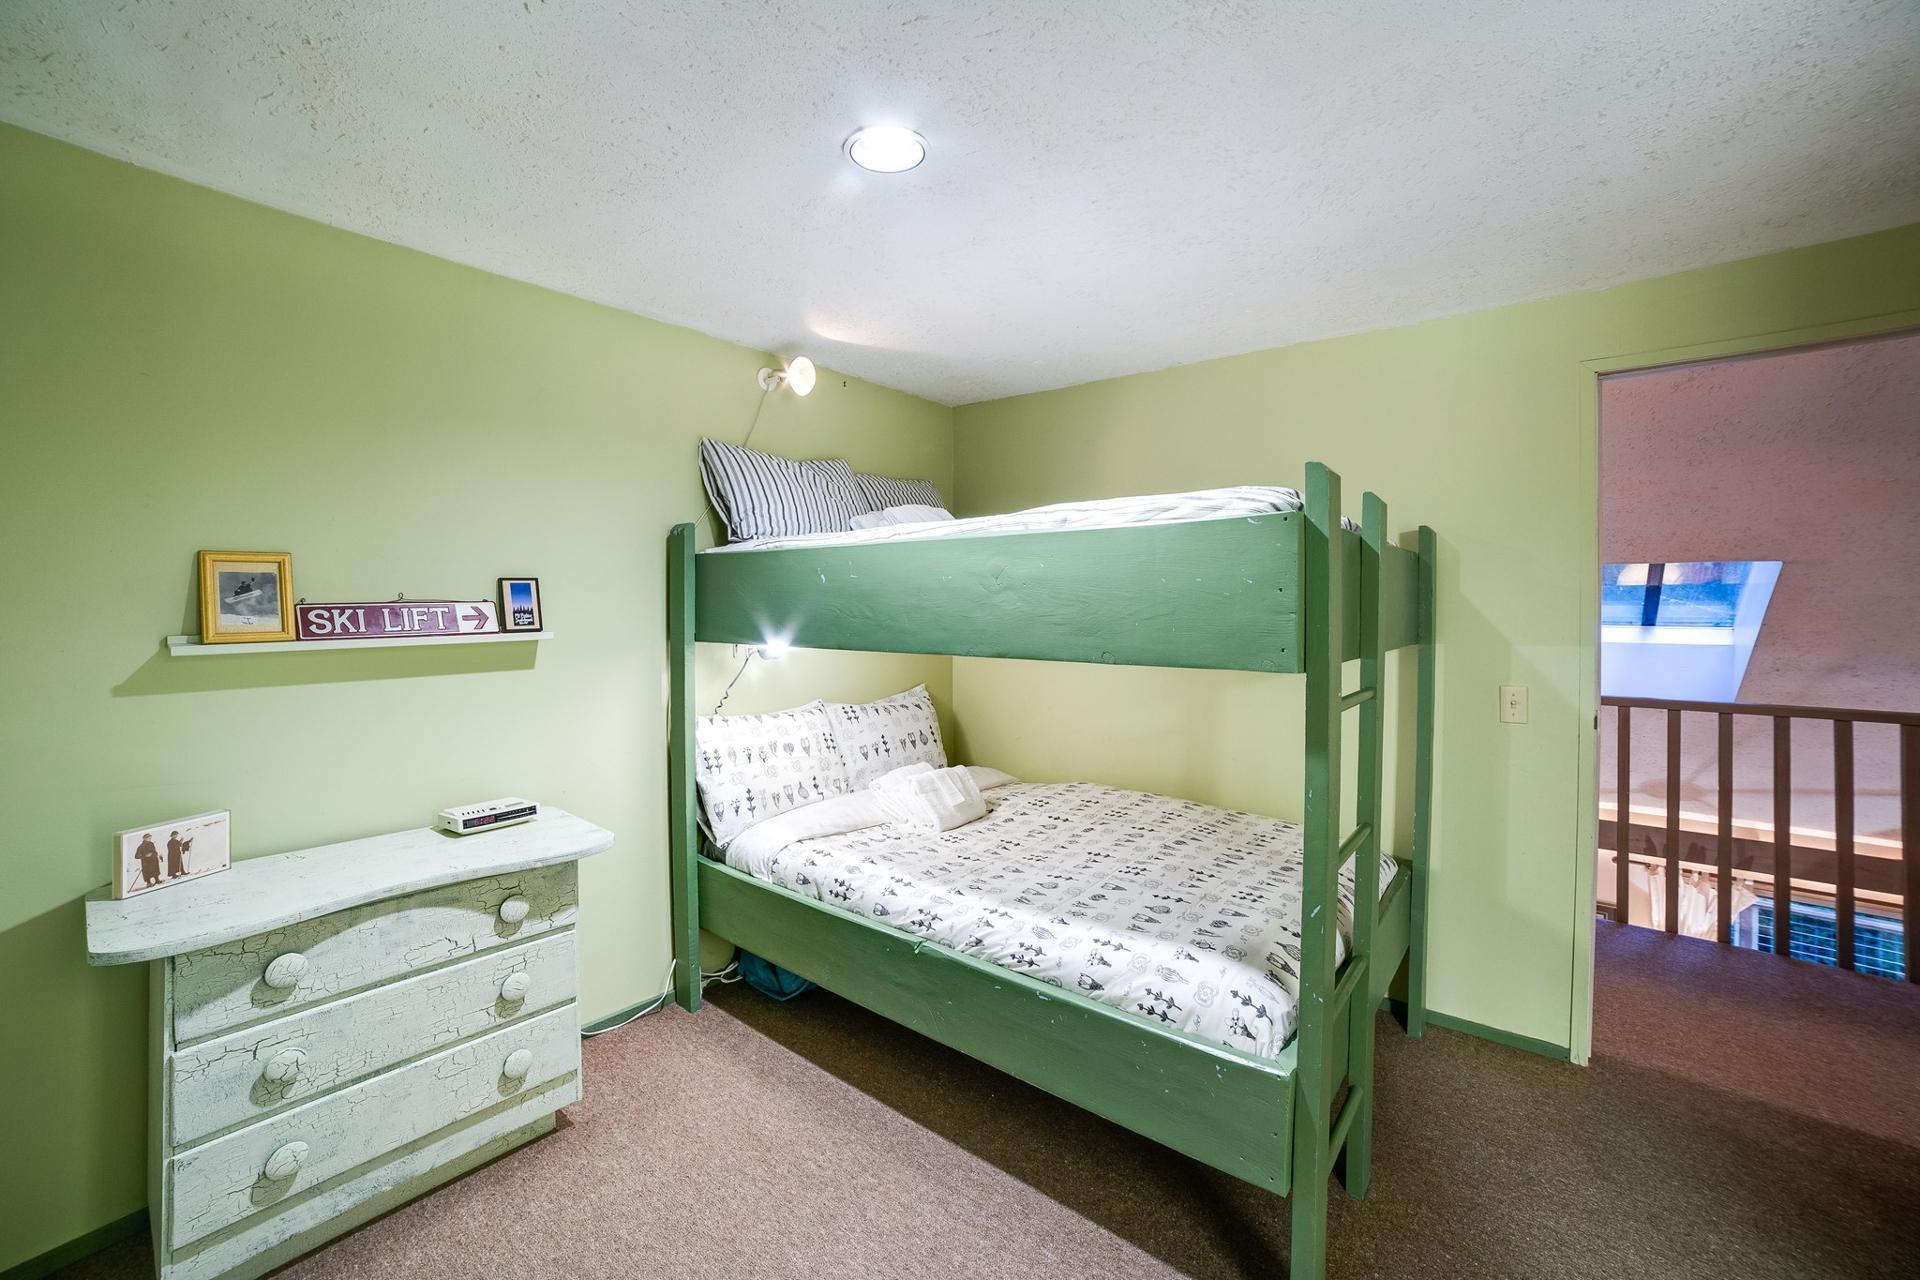 Apartment Mt  Baker Lodging Cabin  55 - HOT TUB  WOOD STOVE  BBQ  SLEEPS 10  photo 3999996